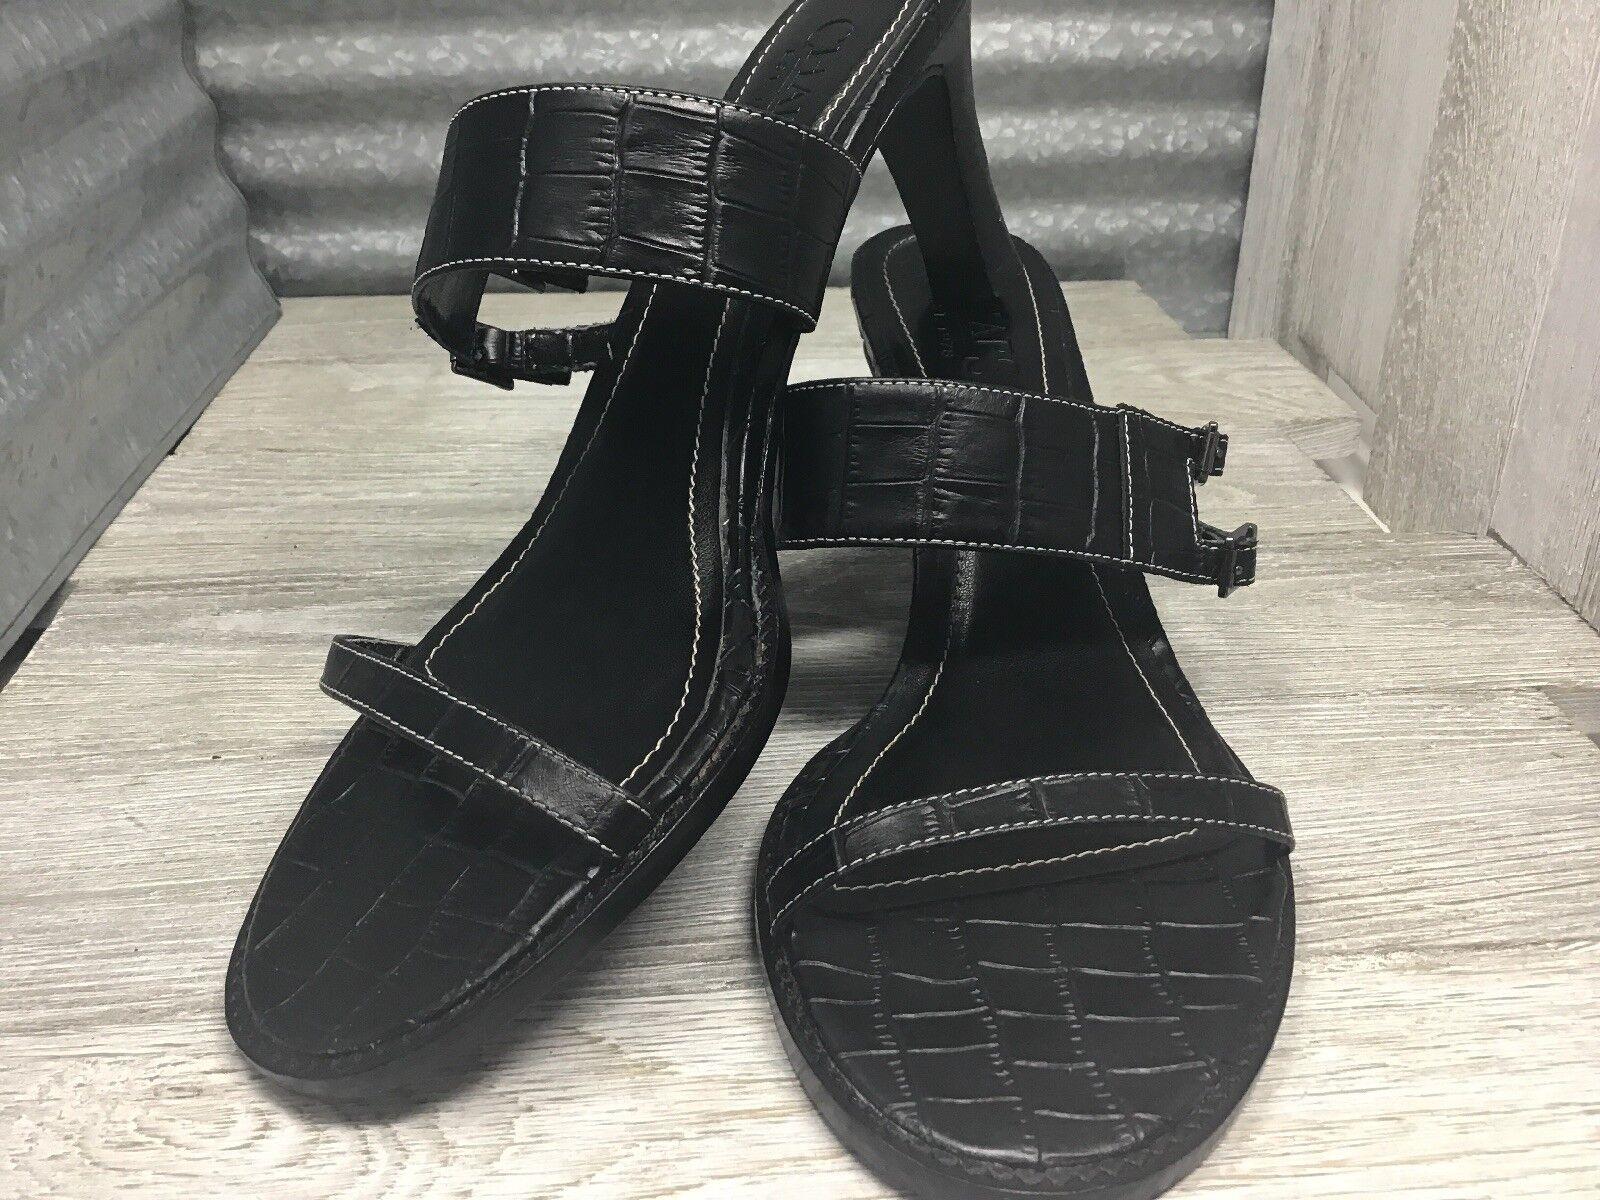 Chaps Sandals Black Leather Straps Heel Buckle Alligator Stamp Woman Heel Straps 6b0fd4